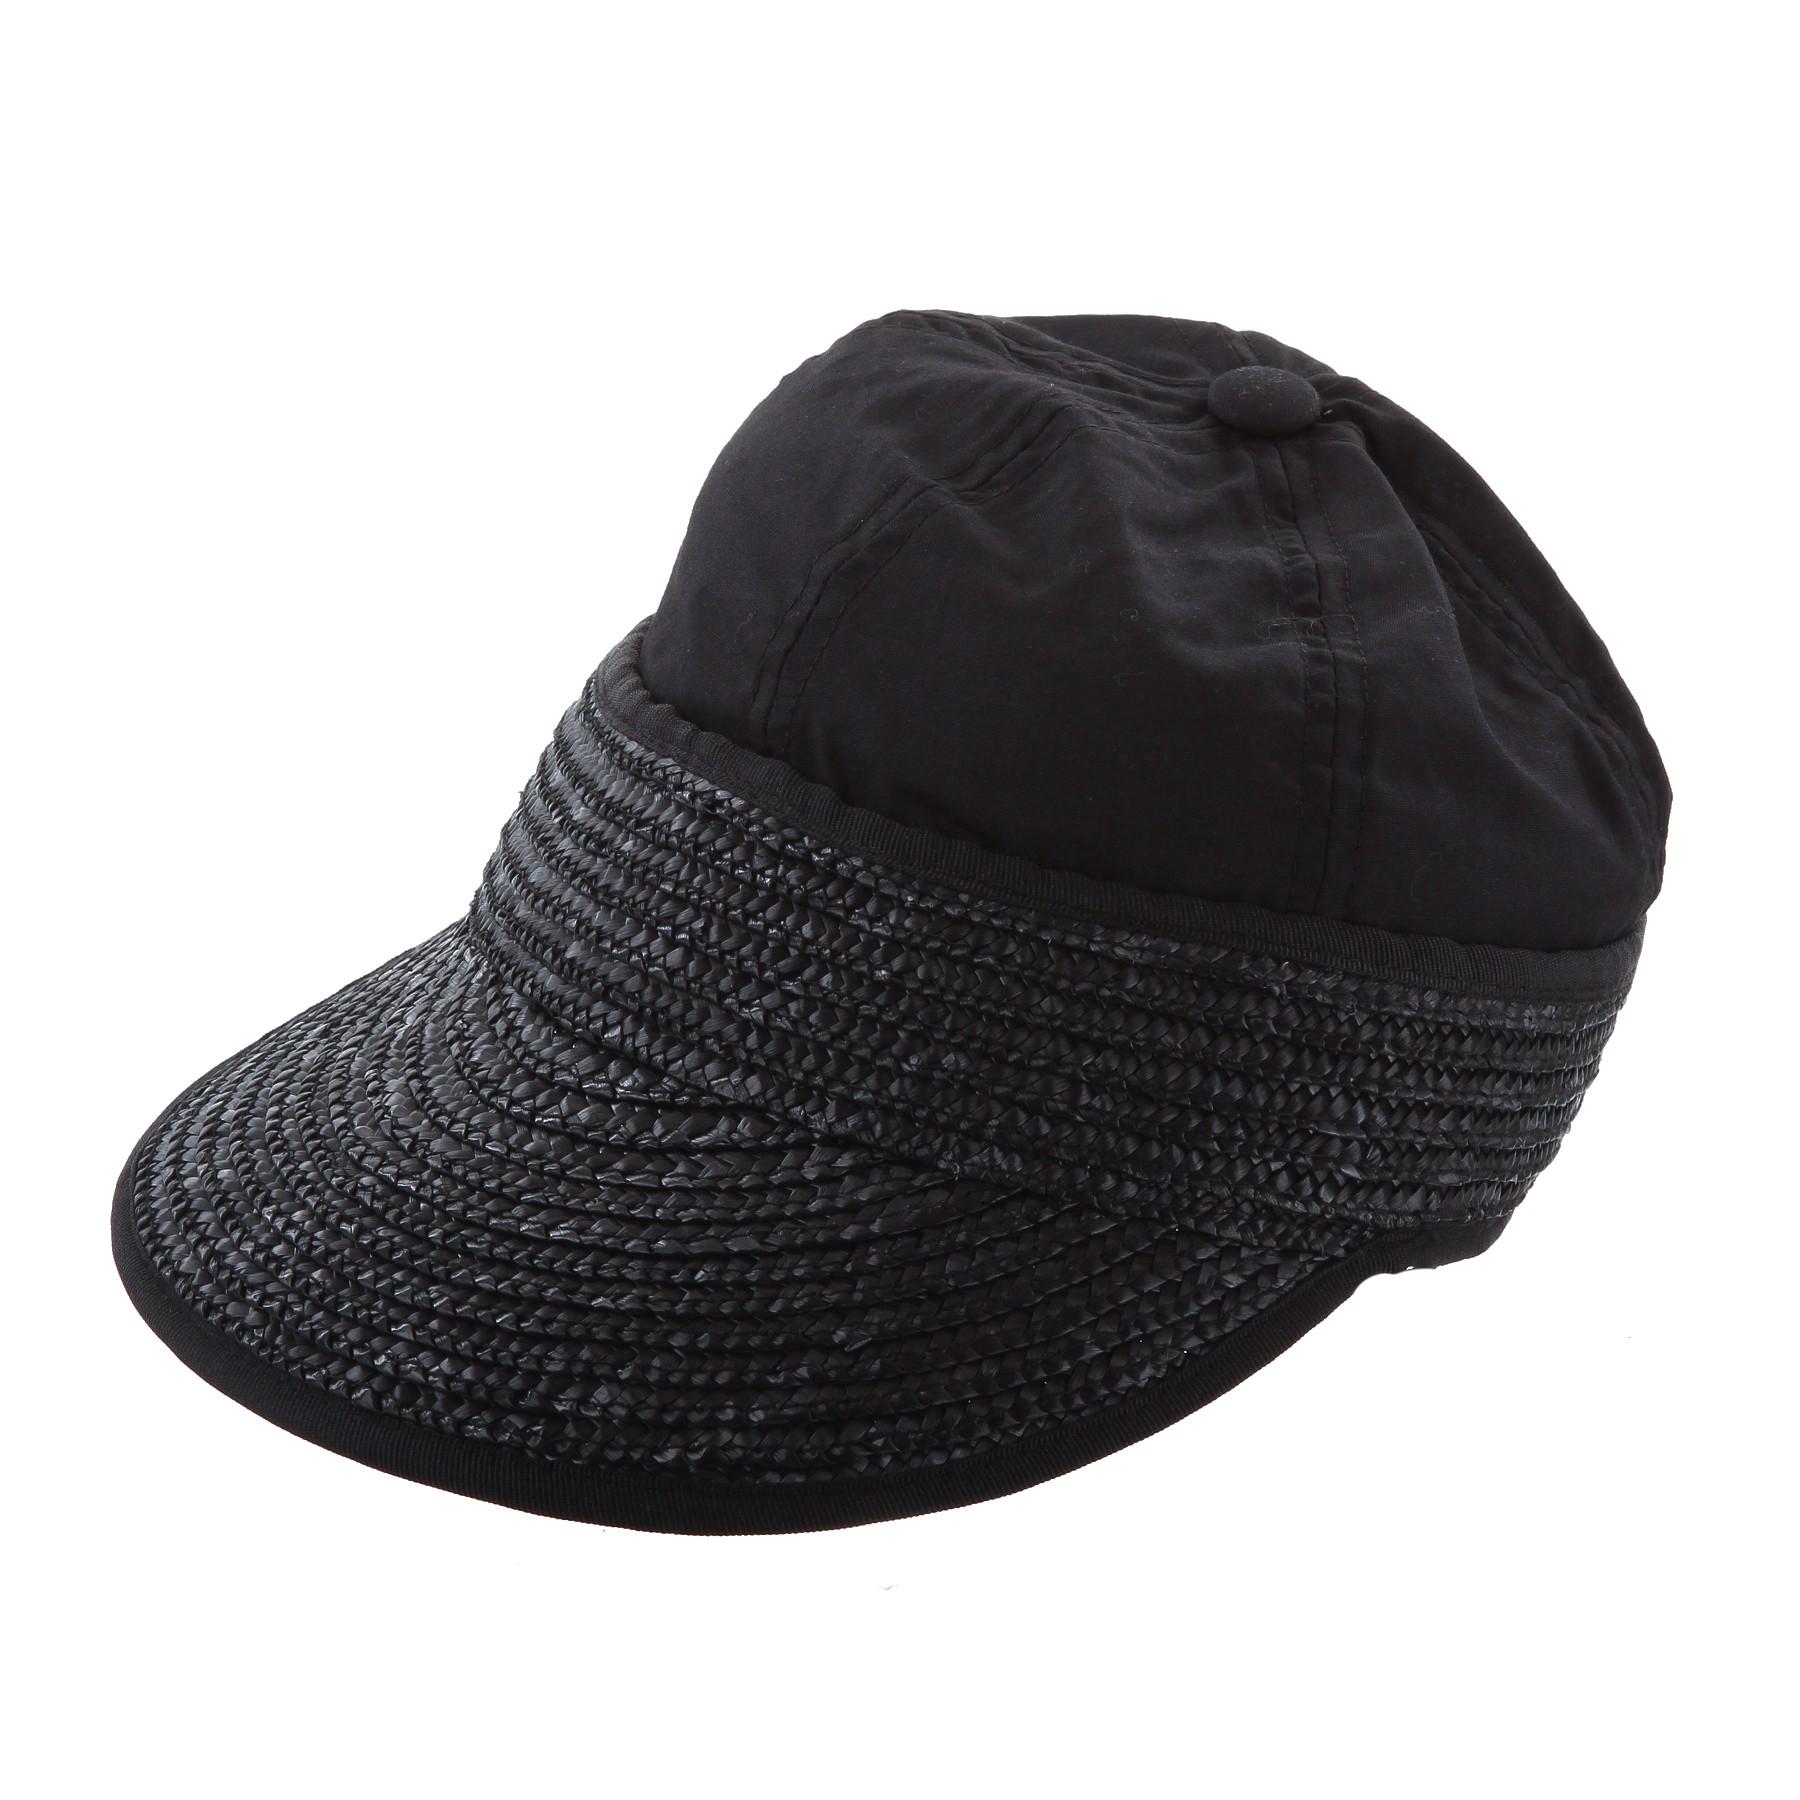 SEEBERGER Stroh/Stoffcap, Mütze mit Schirm, Umfang 56 cm Bild https://cdn03.plentymarkets.com/zsy4vjx32p87/item/images/4926/full/4050655425143-ama-01.JPG